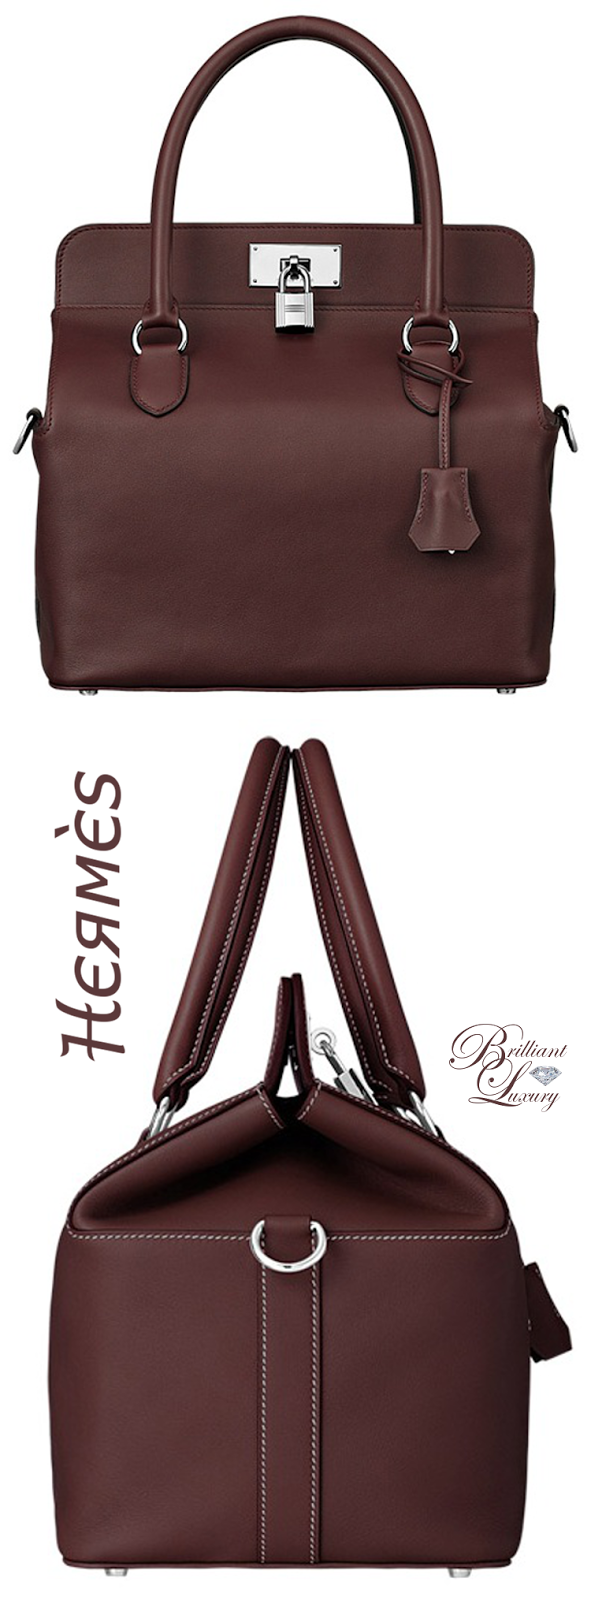 Brilliant Luxury * Hermès 'Toolbox' Bag